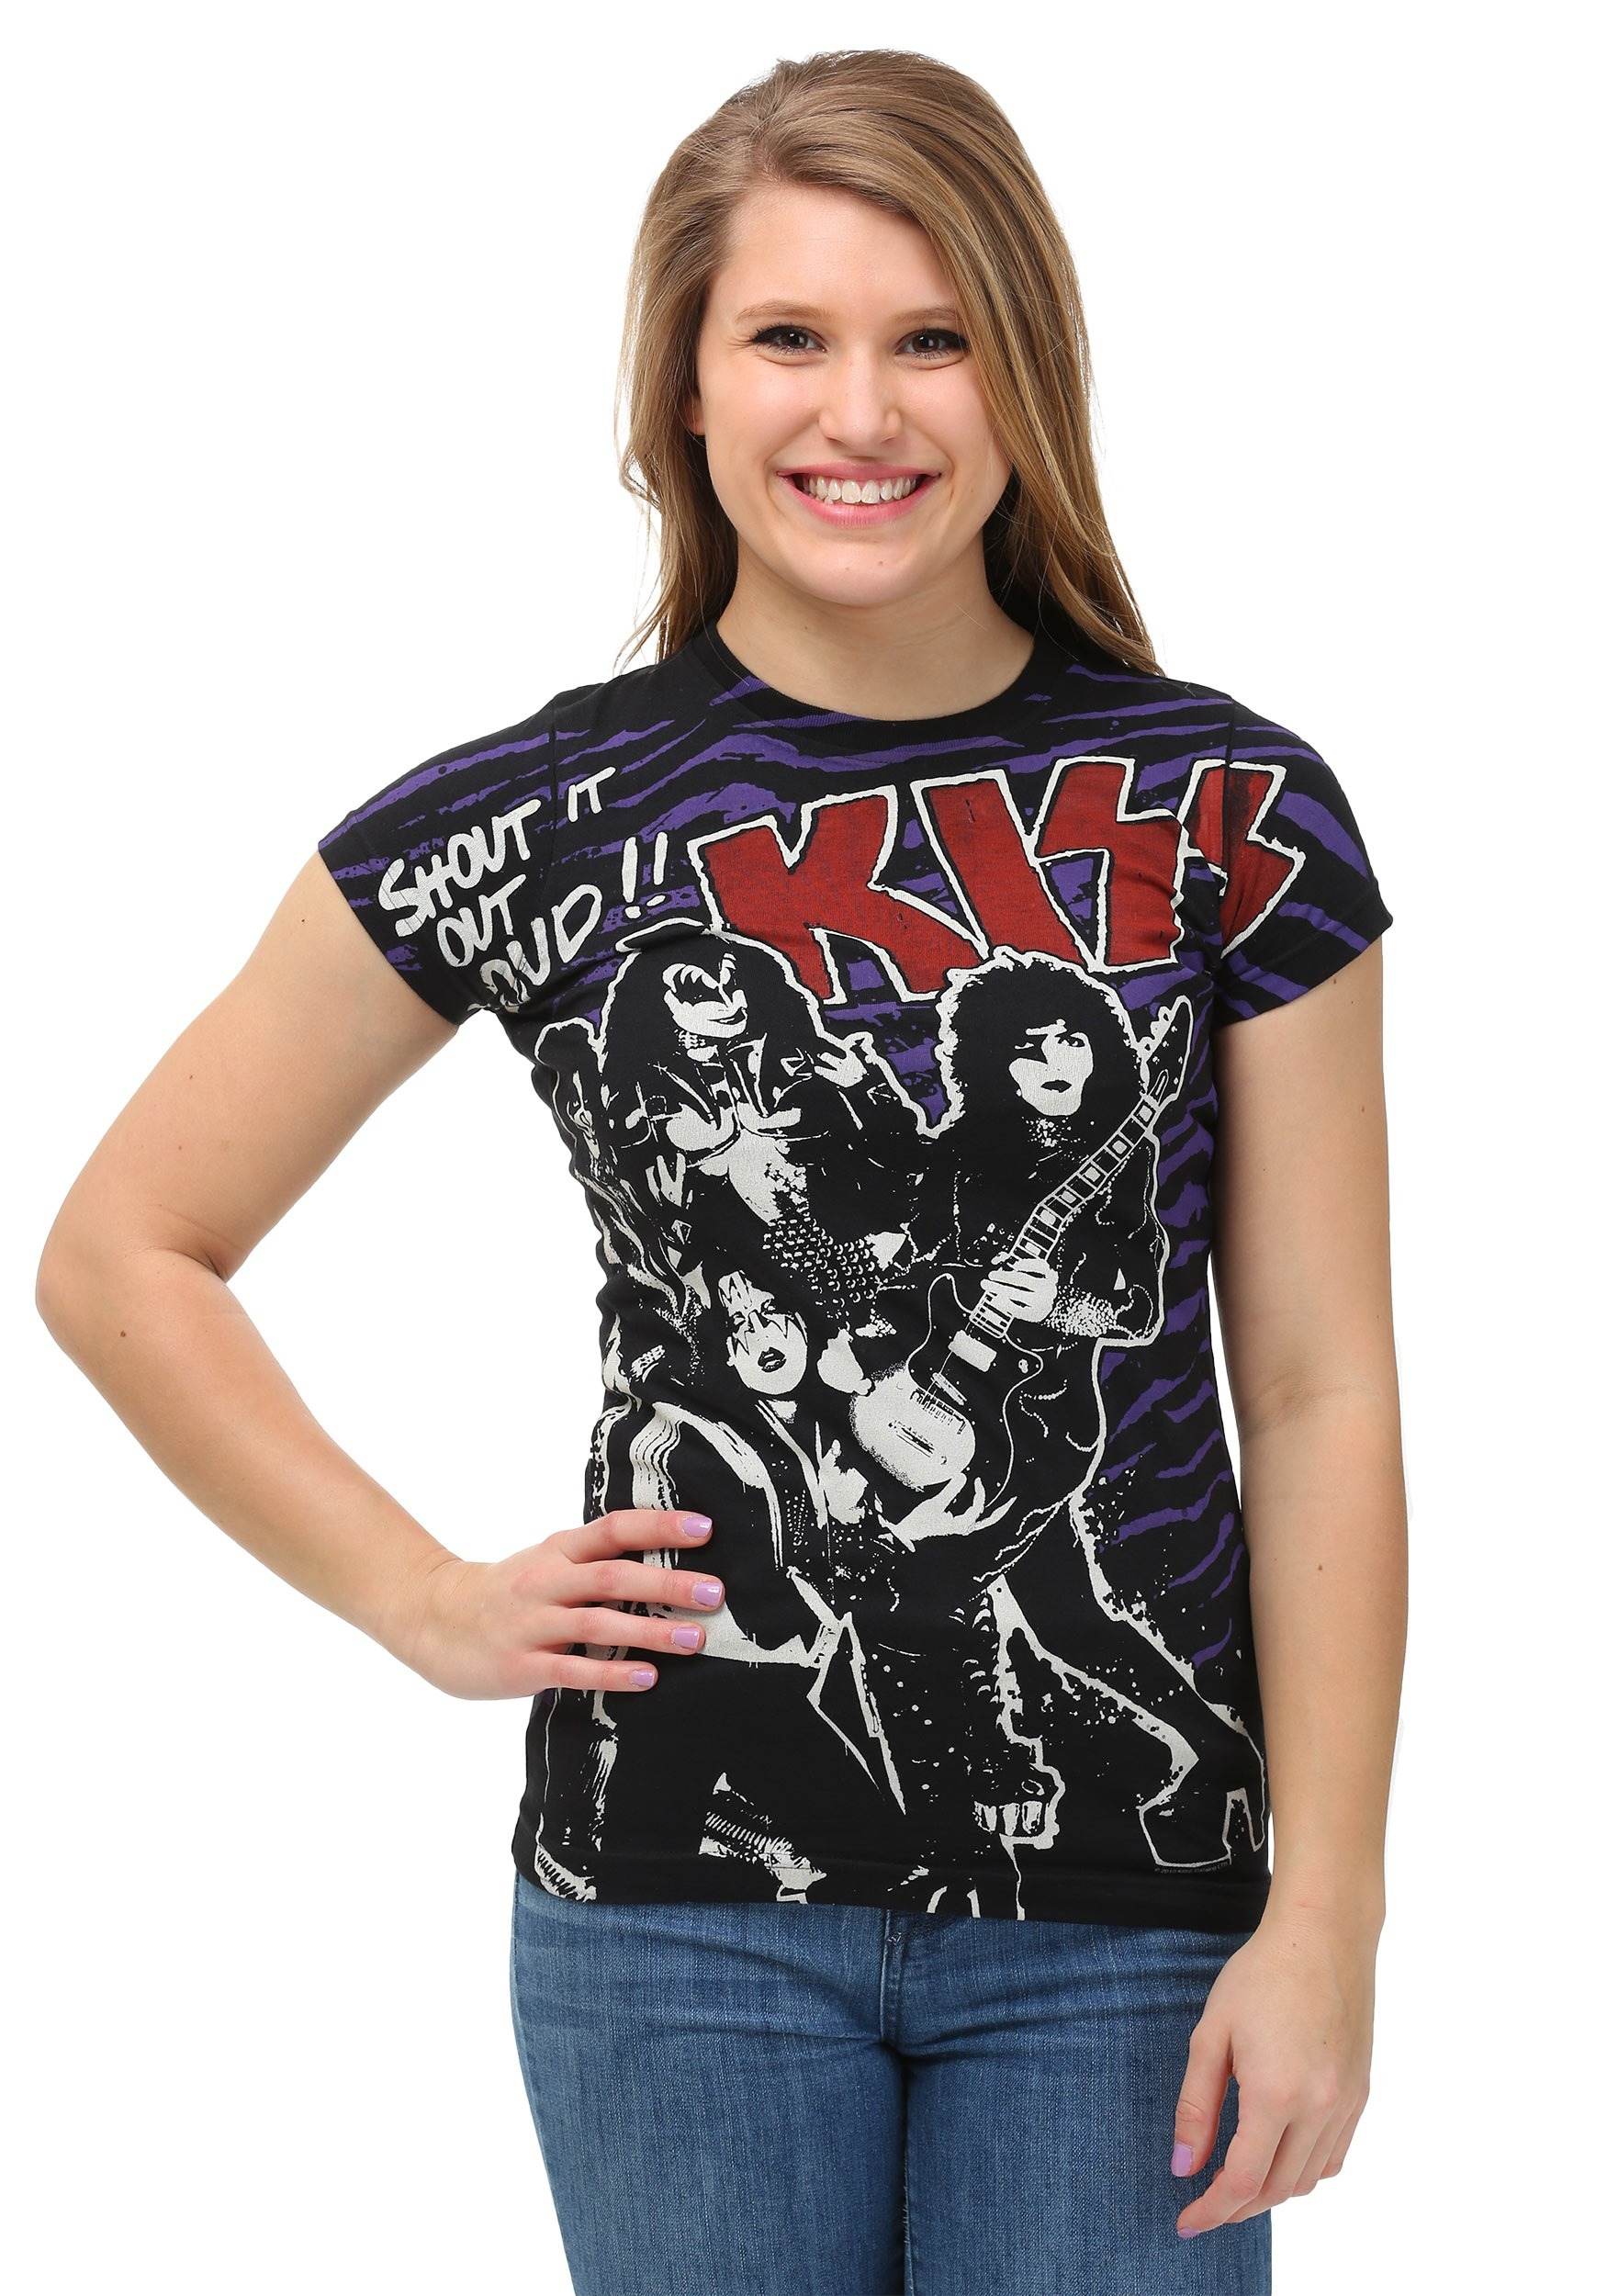 Kiss Shout It Out Loud Christine Sixteen